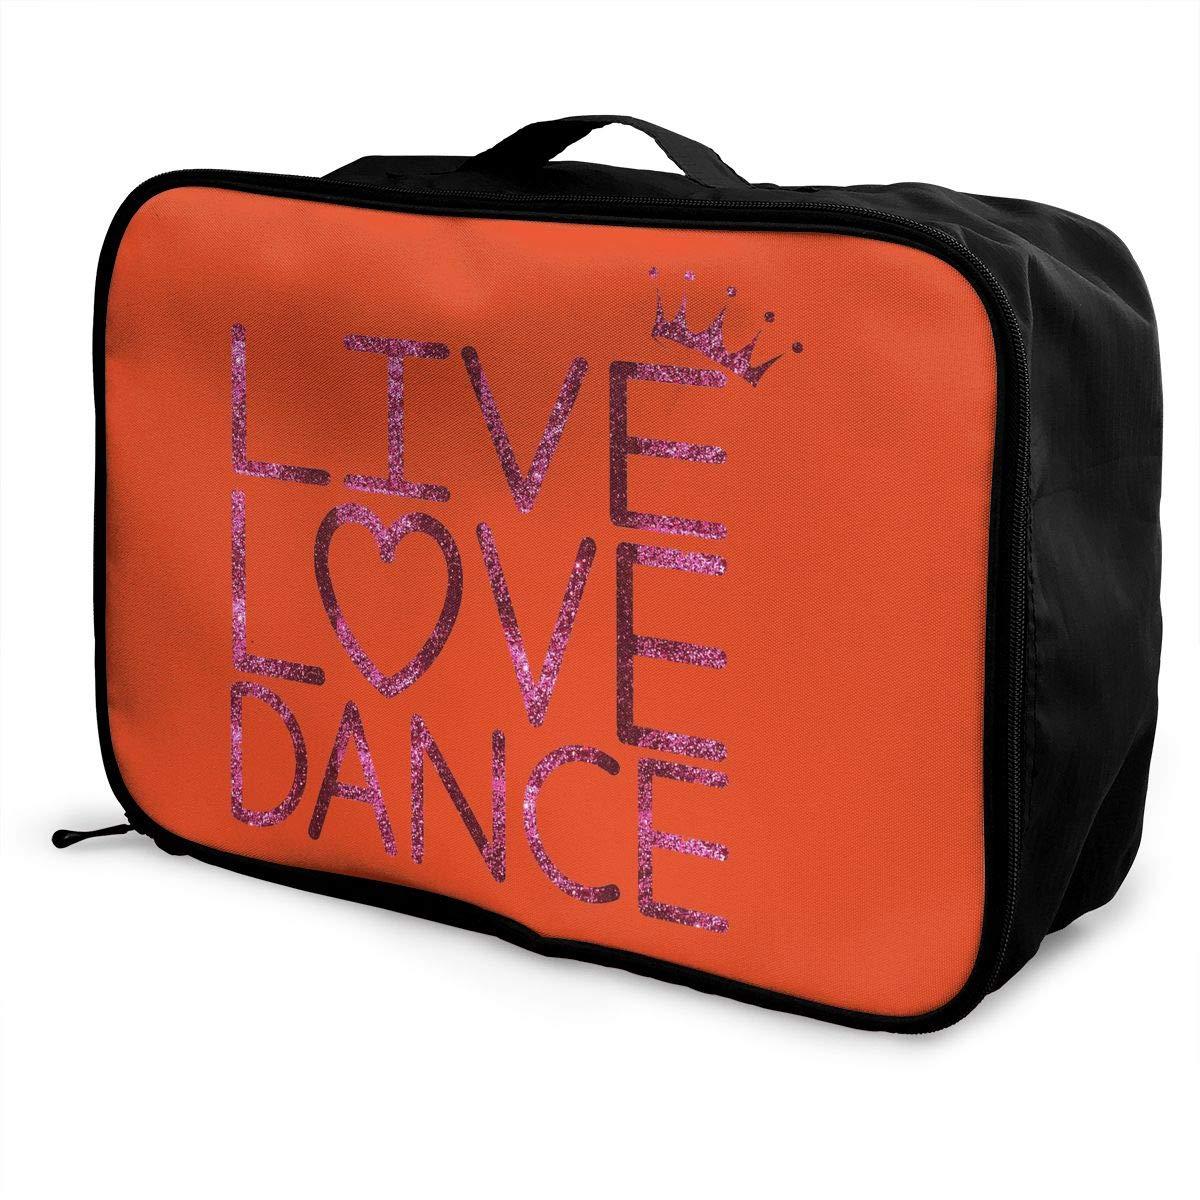 Travel Luggage Duffle Bag Lightweight Portable Handbag Live Love Dance Large Capacity Waterproof Foldable Storage Tote